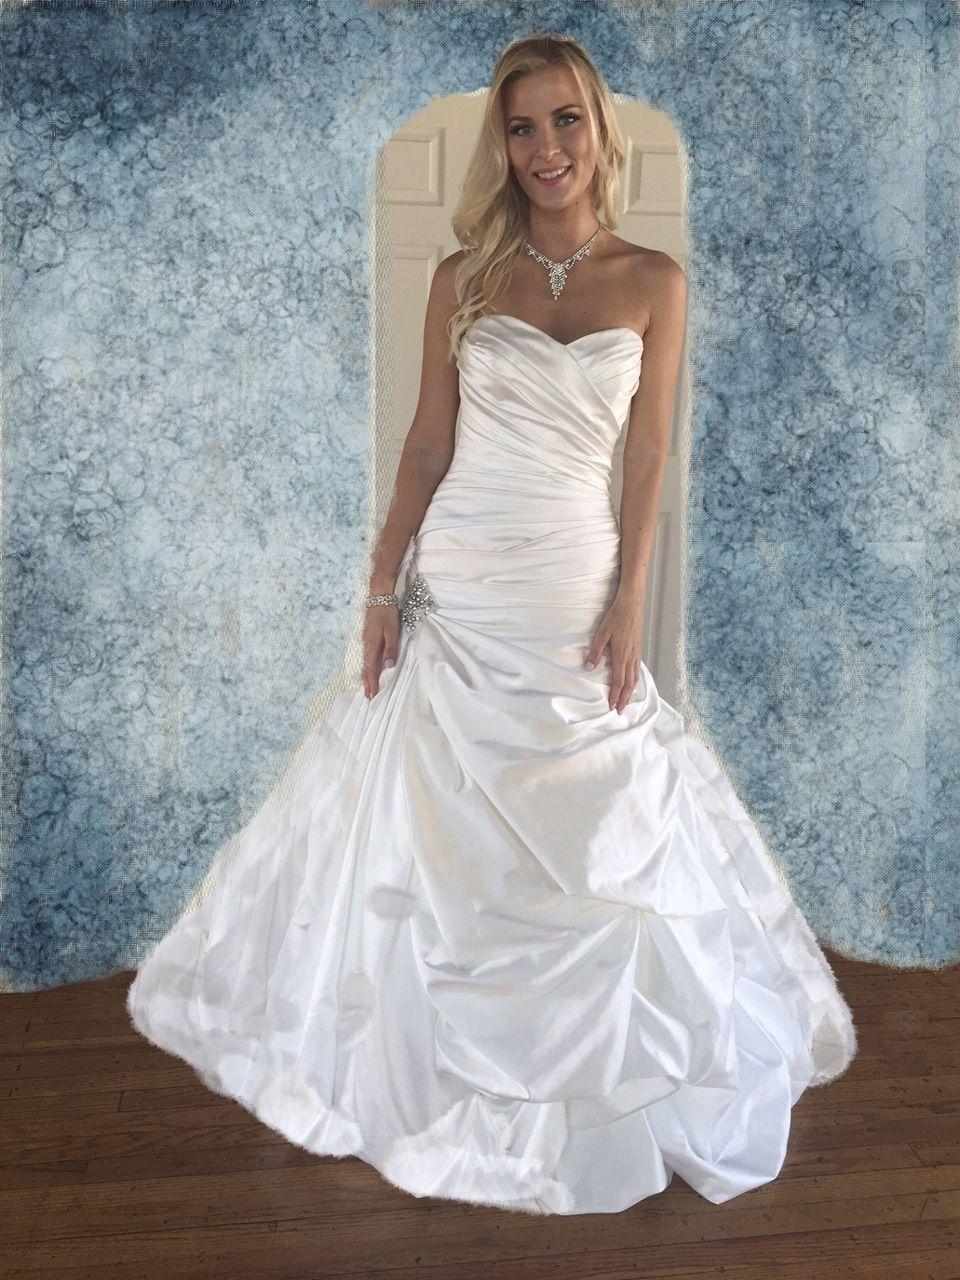 Maggie Sottero Kendra Wedding Dress. Maggie Sottero Kendra Wedding ...